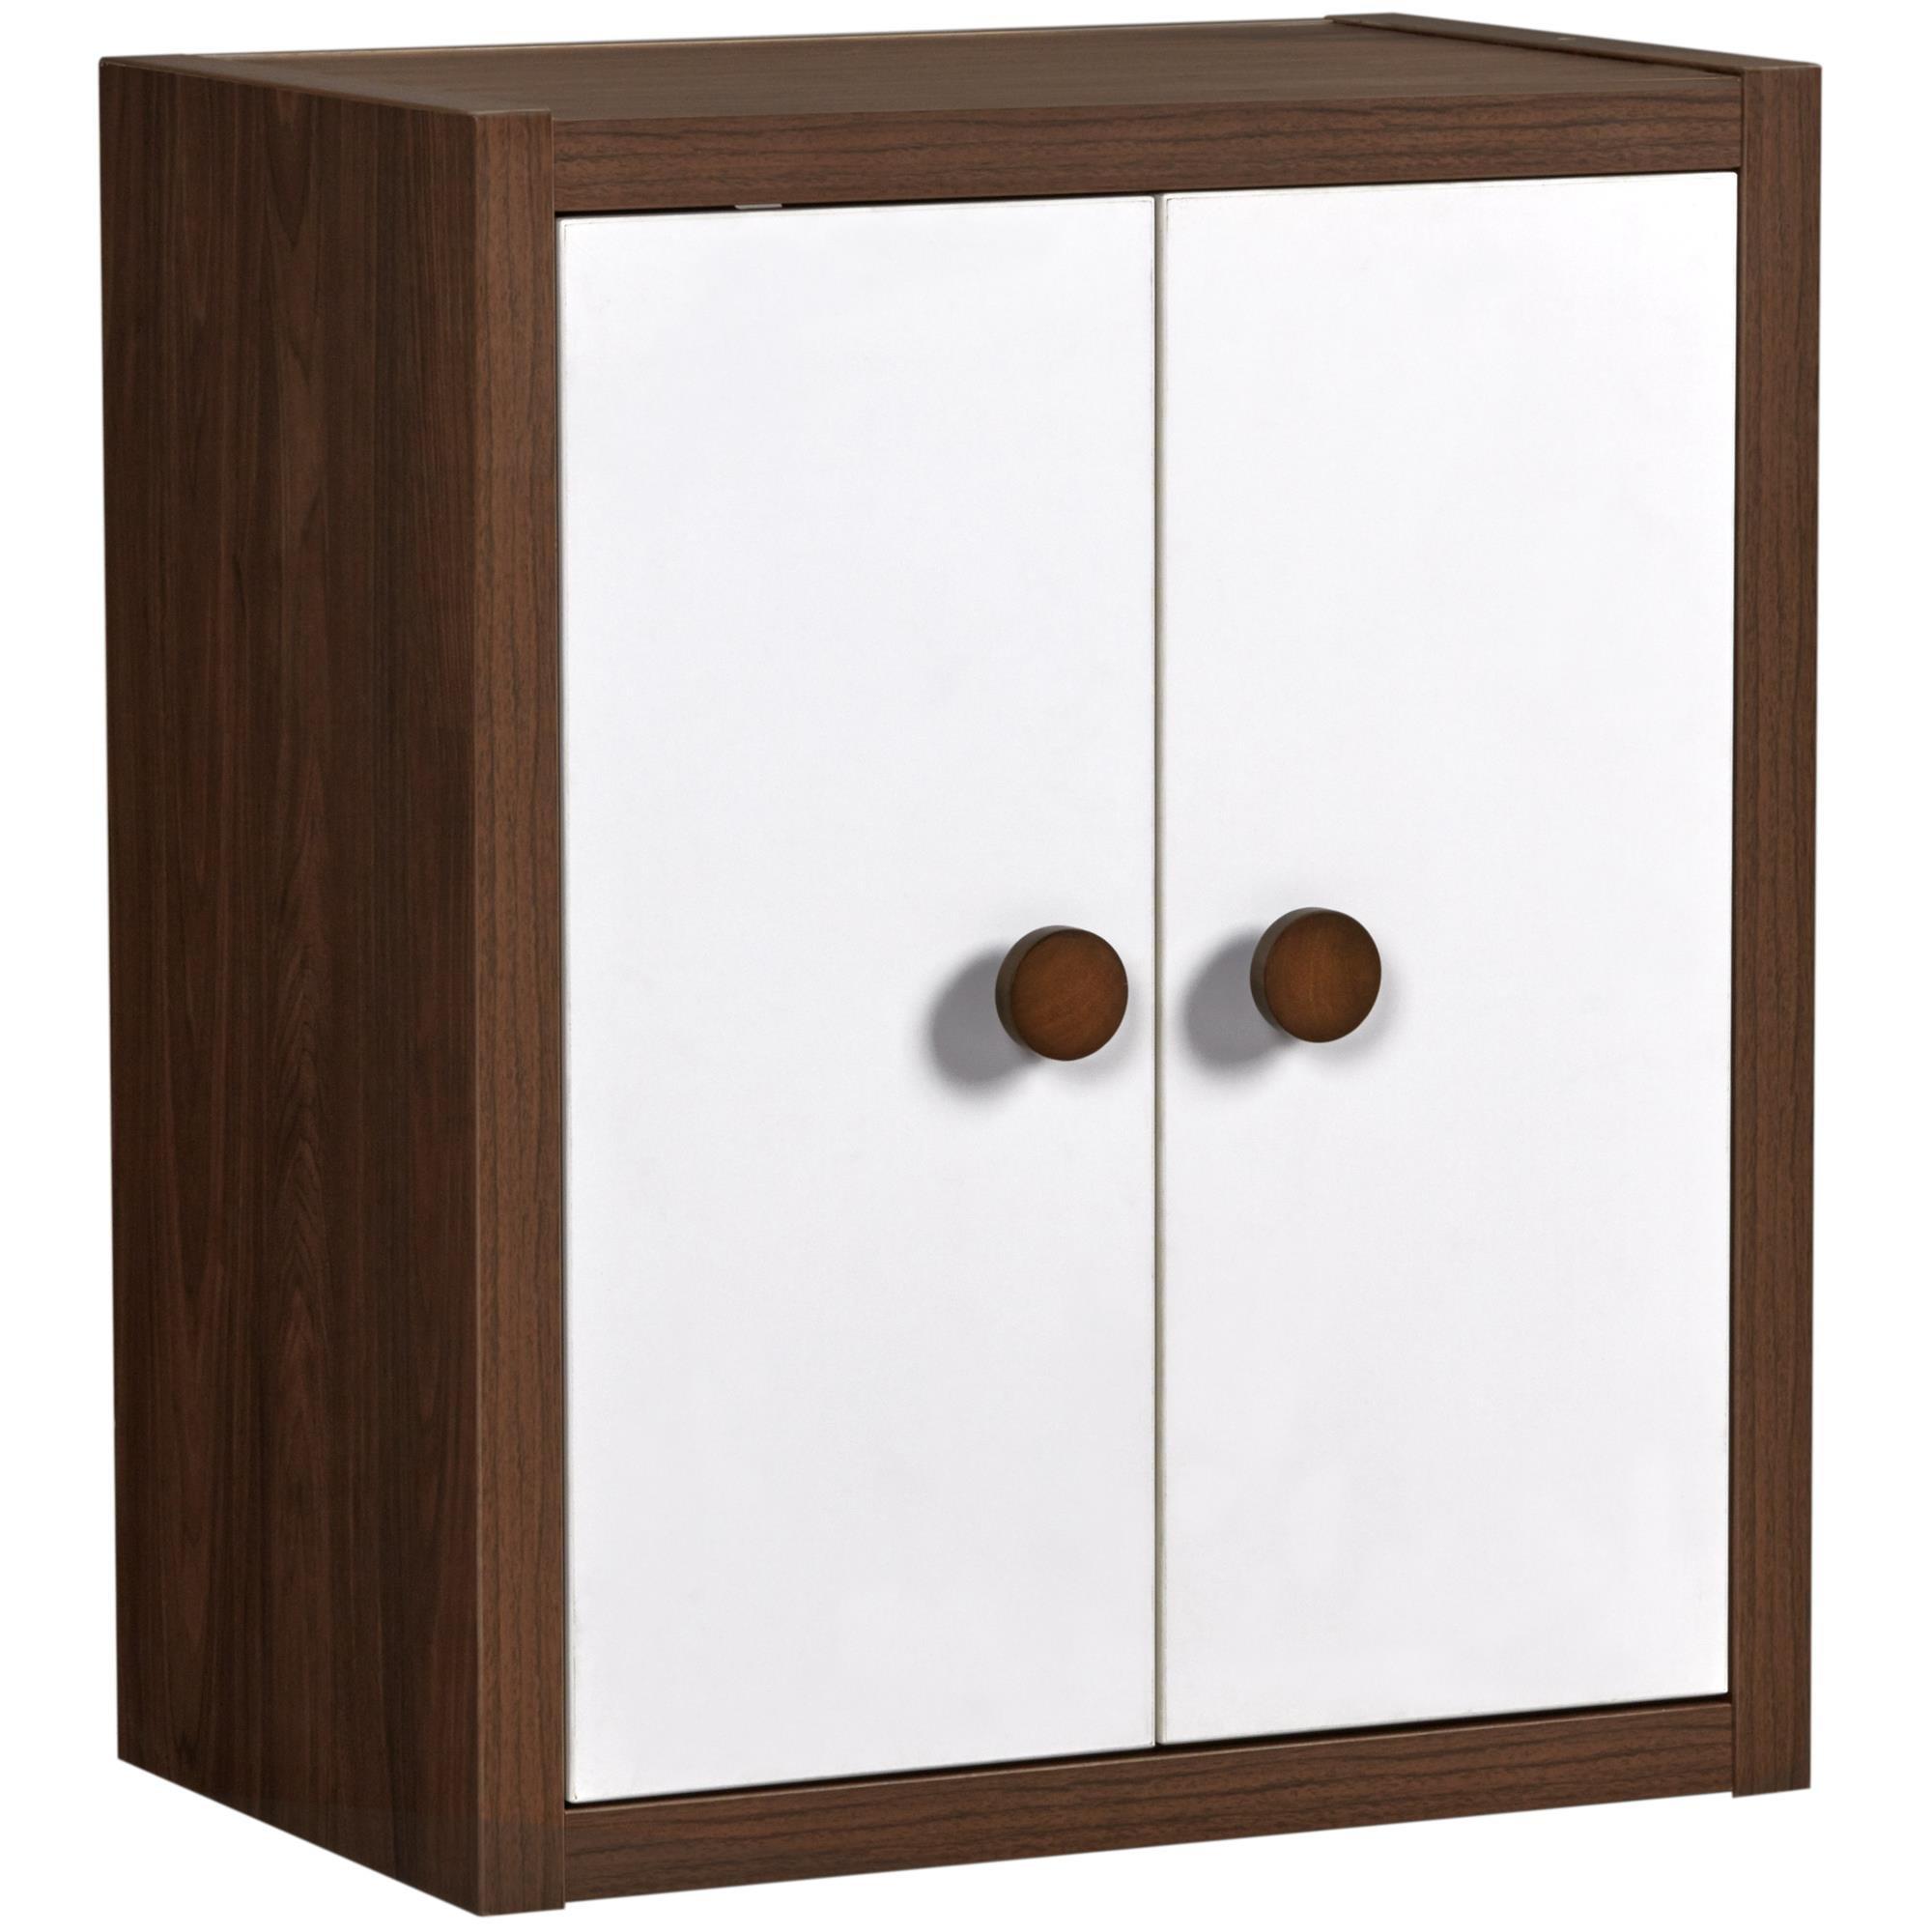 Little Seeds Sierra Ridge Terra Modular Bookcase with Doors, Walnut/White